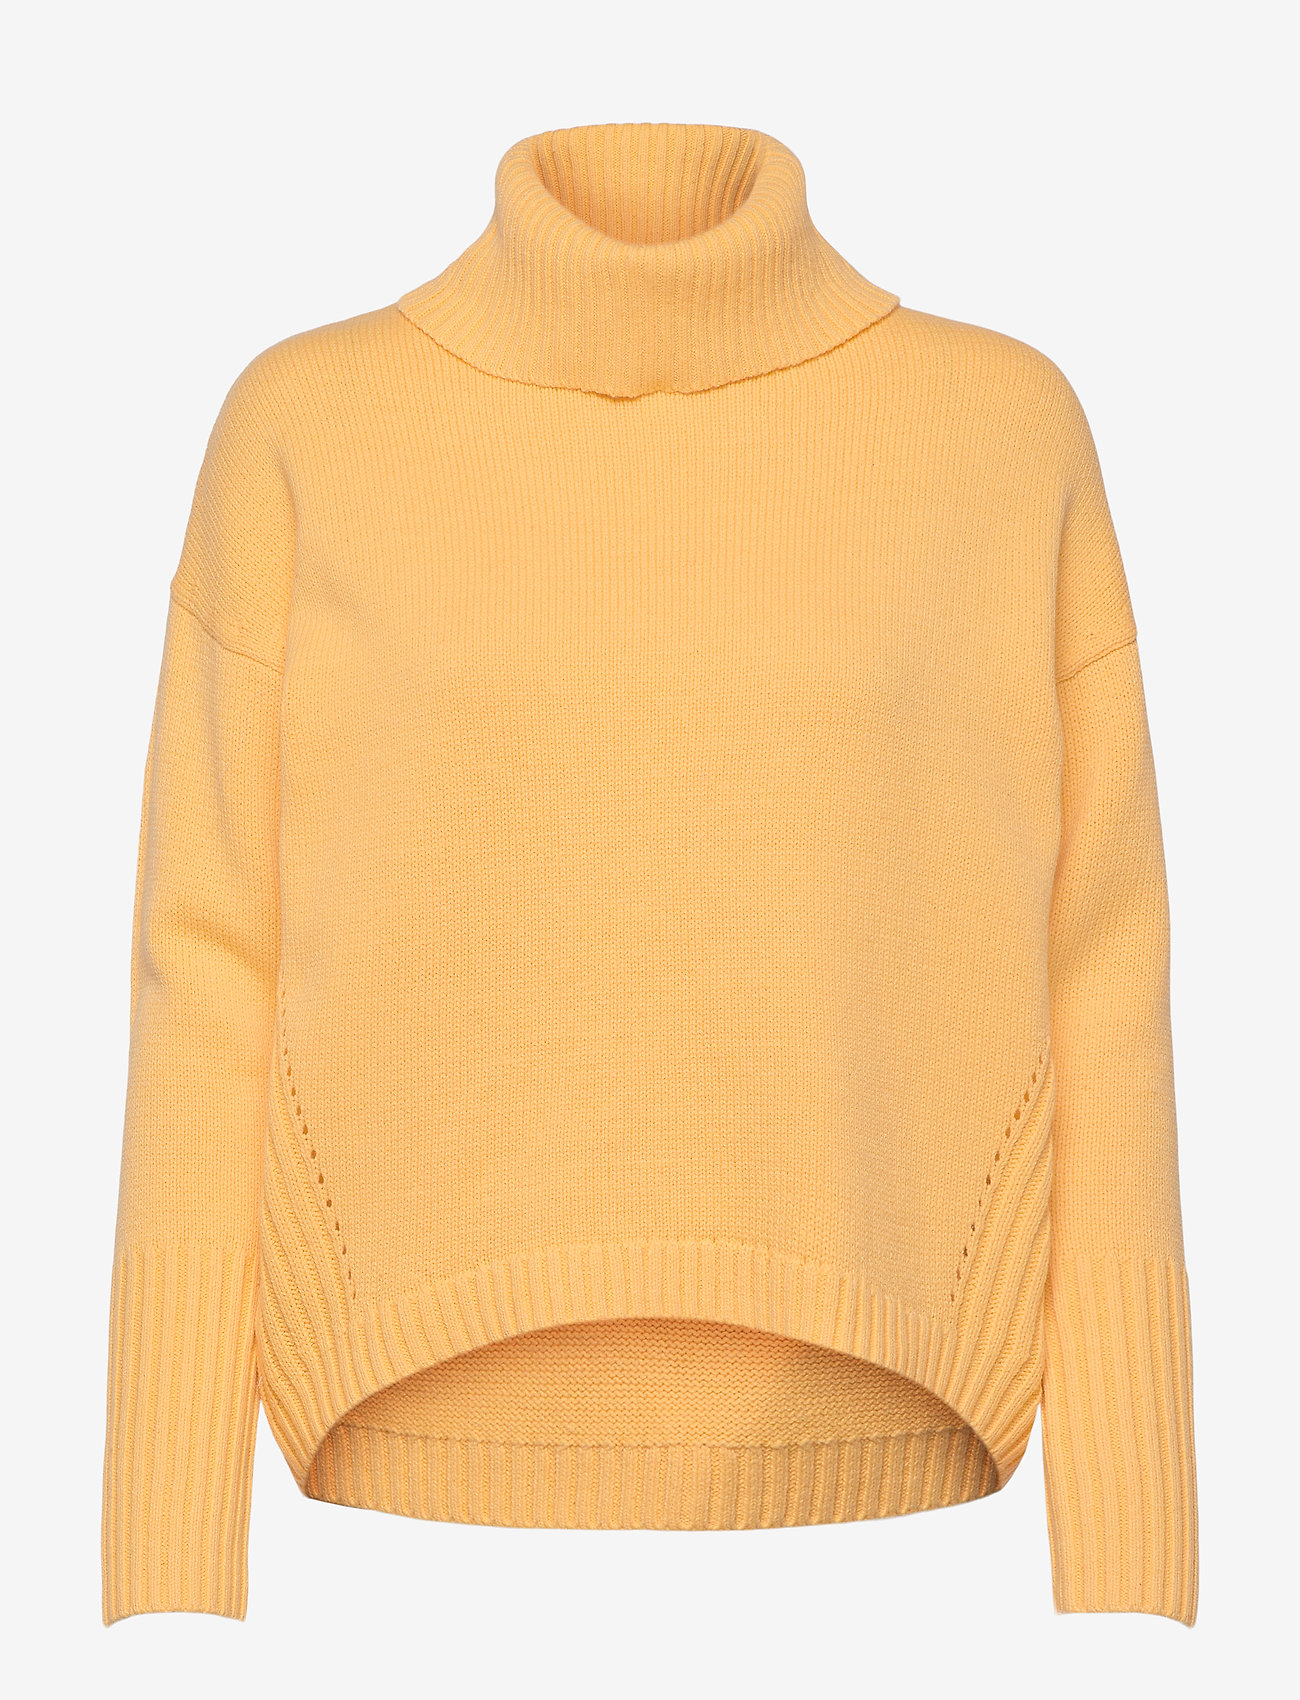 Esprit Casual - Sweaters - turtlenecks - dusty yellow - 0